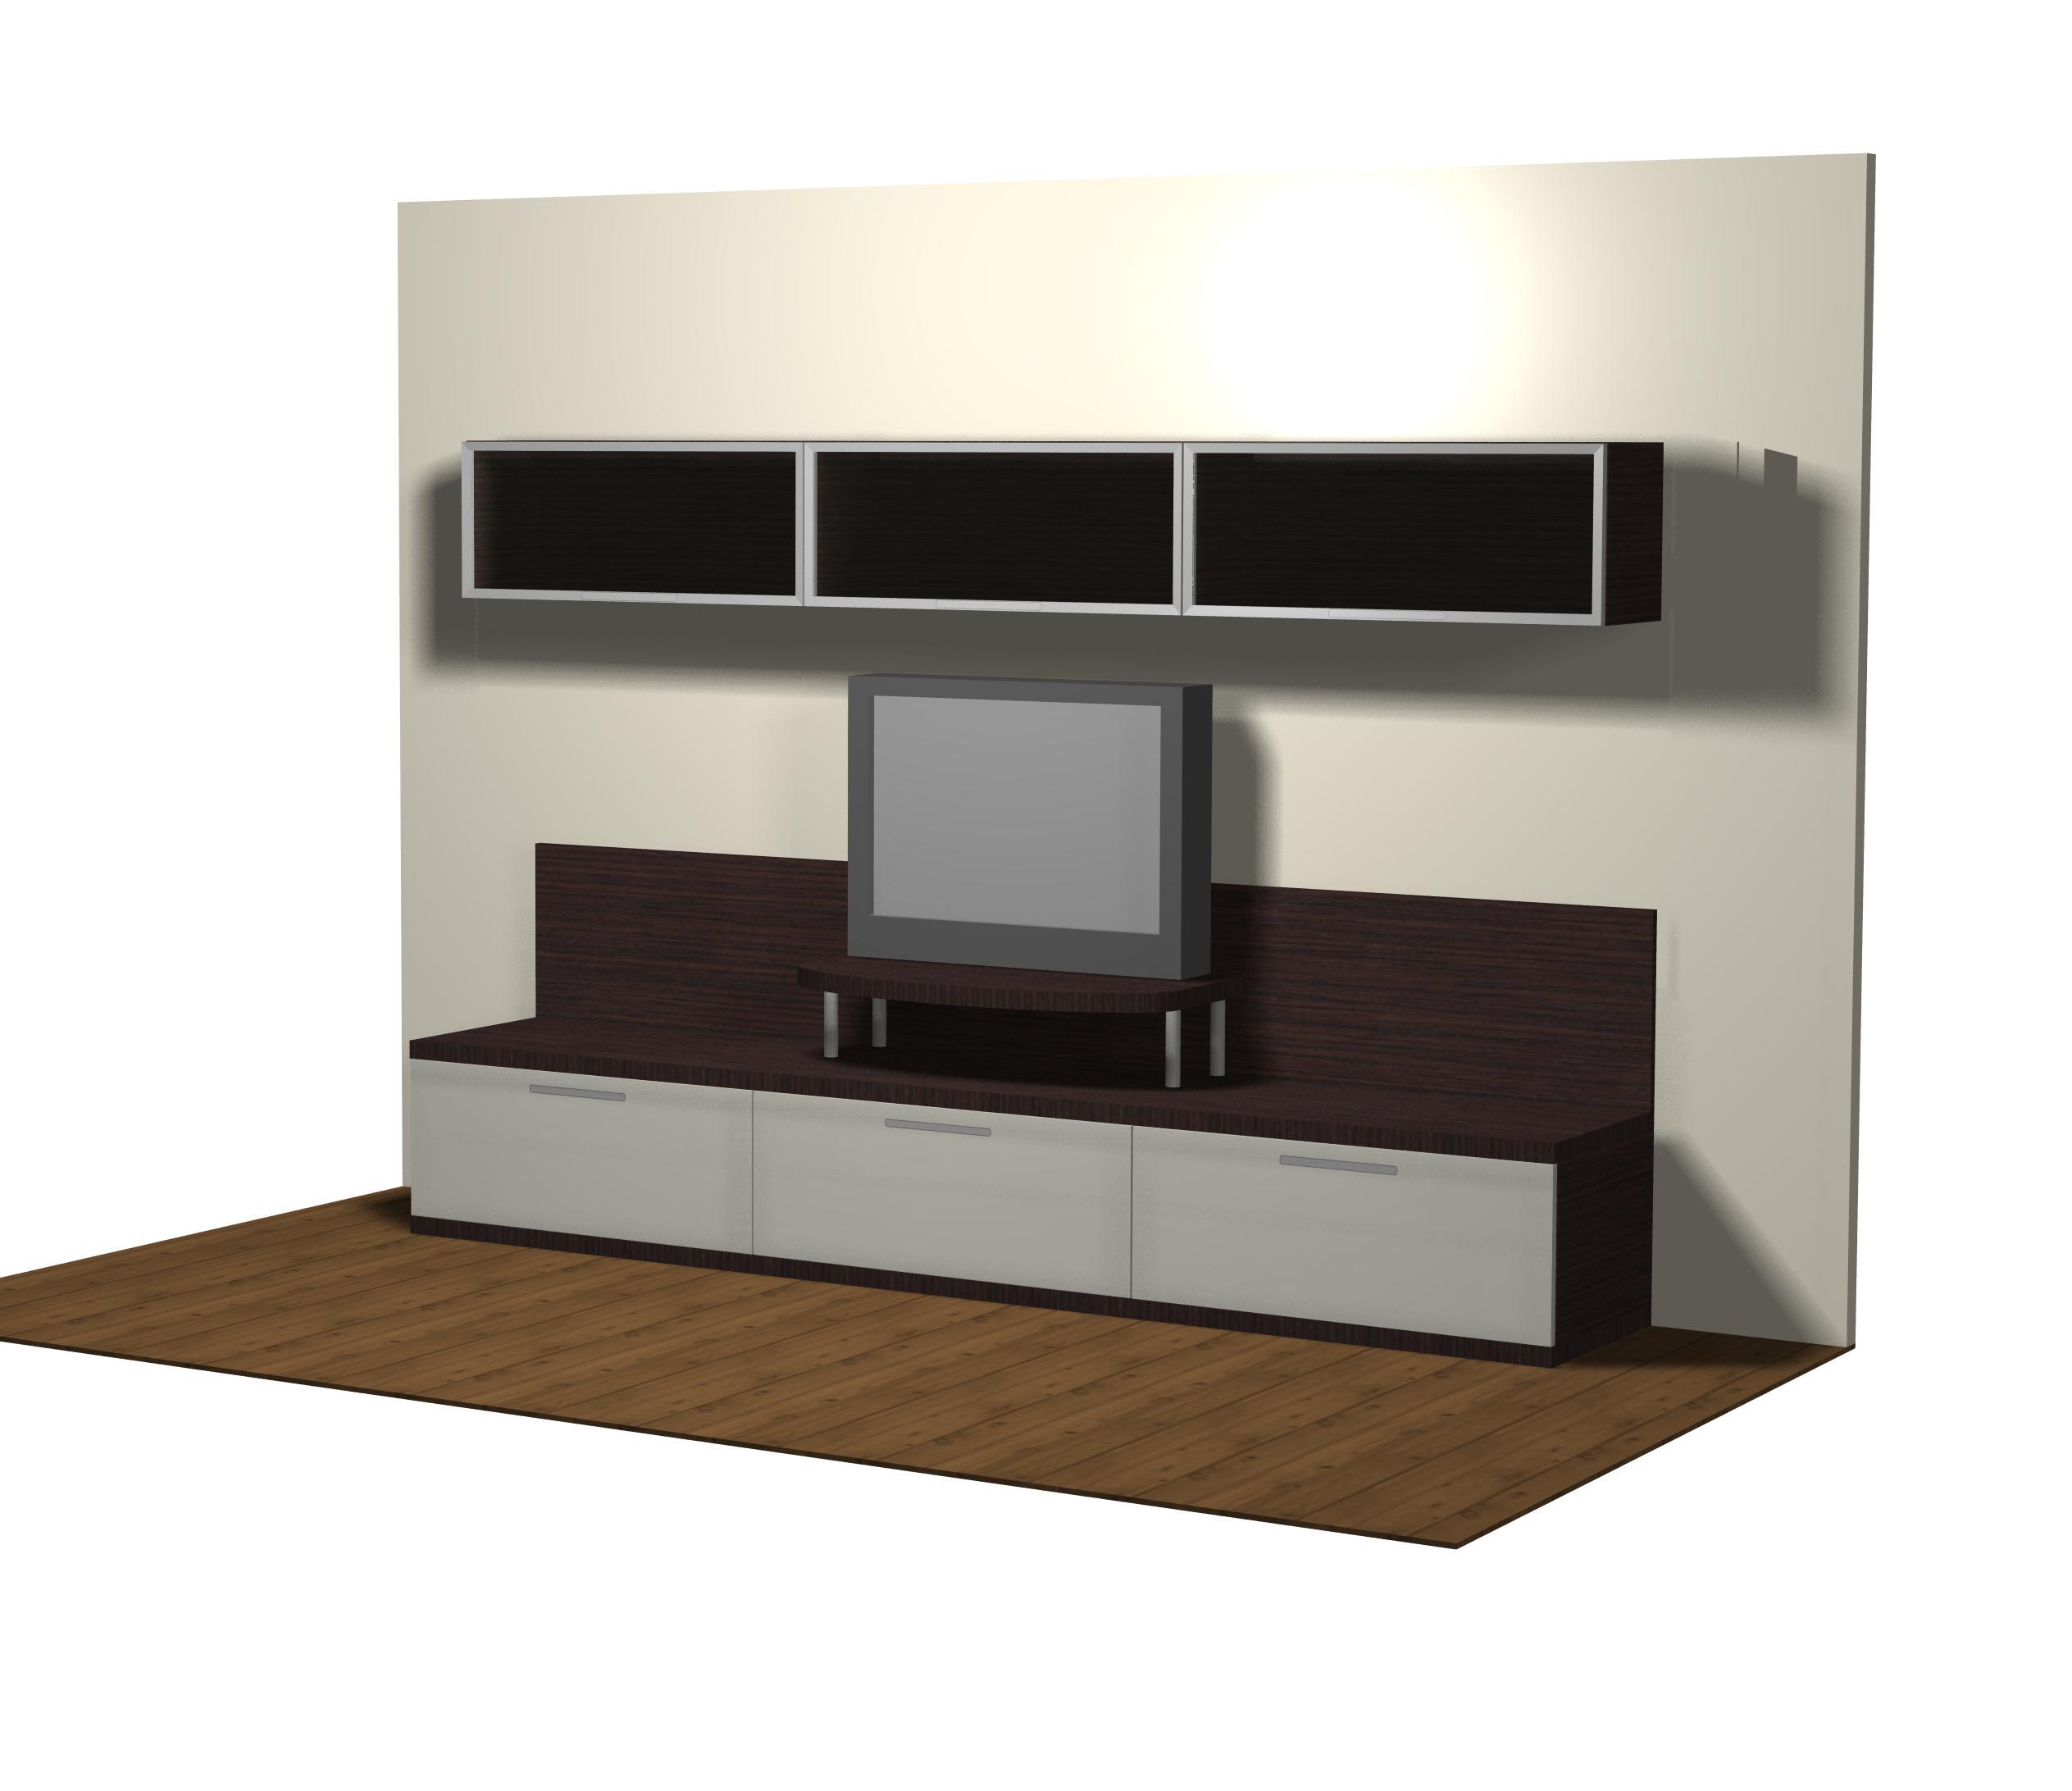 Sala de tv pequena 2 110x70 sala de tv opes para decorar for Decora salas